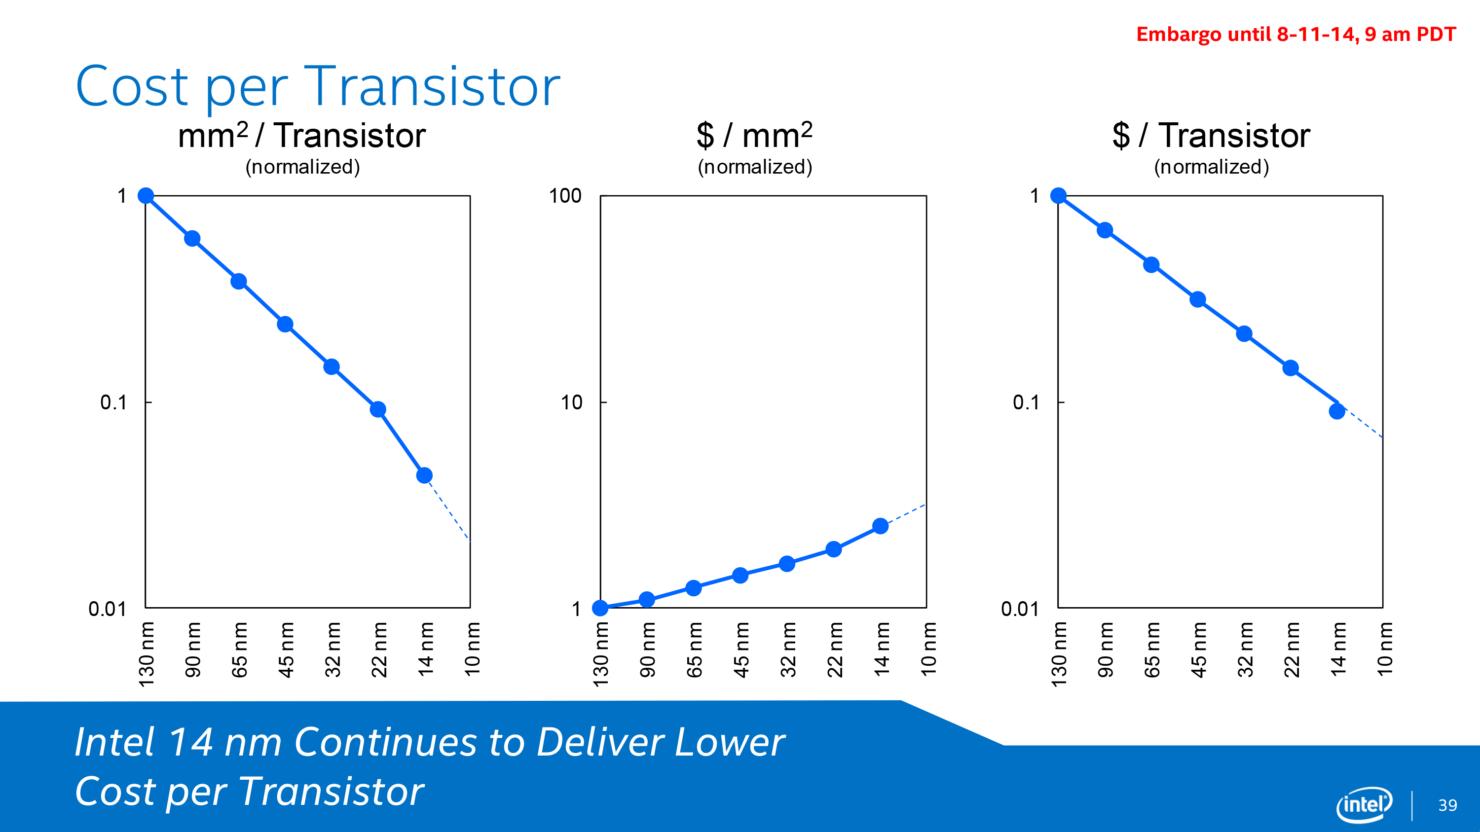 intel-14nm-cost-per-transistor